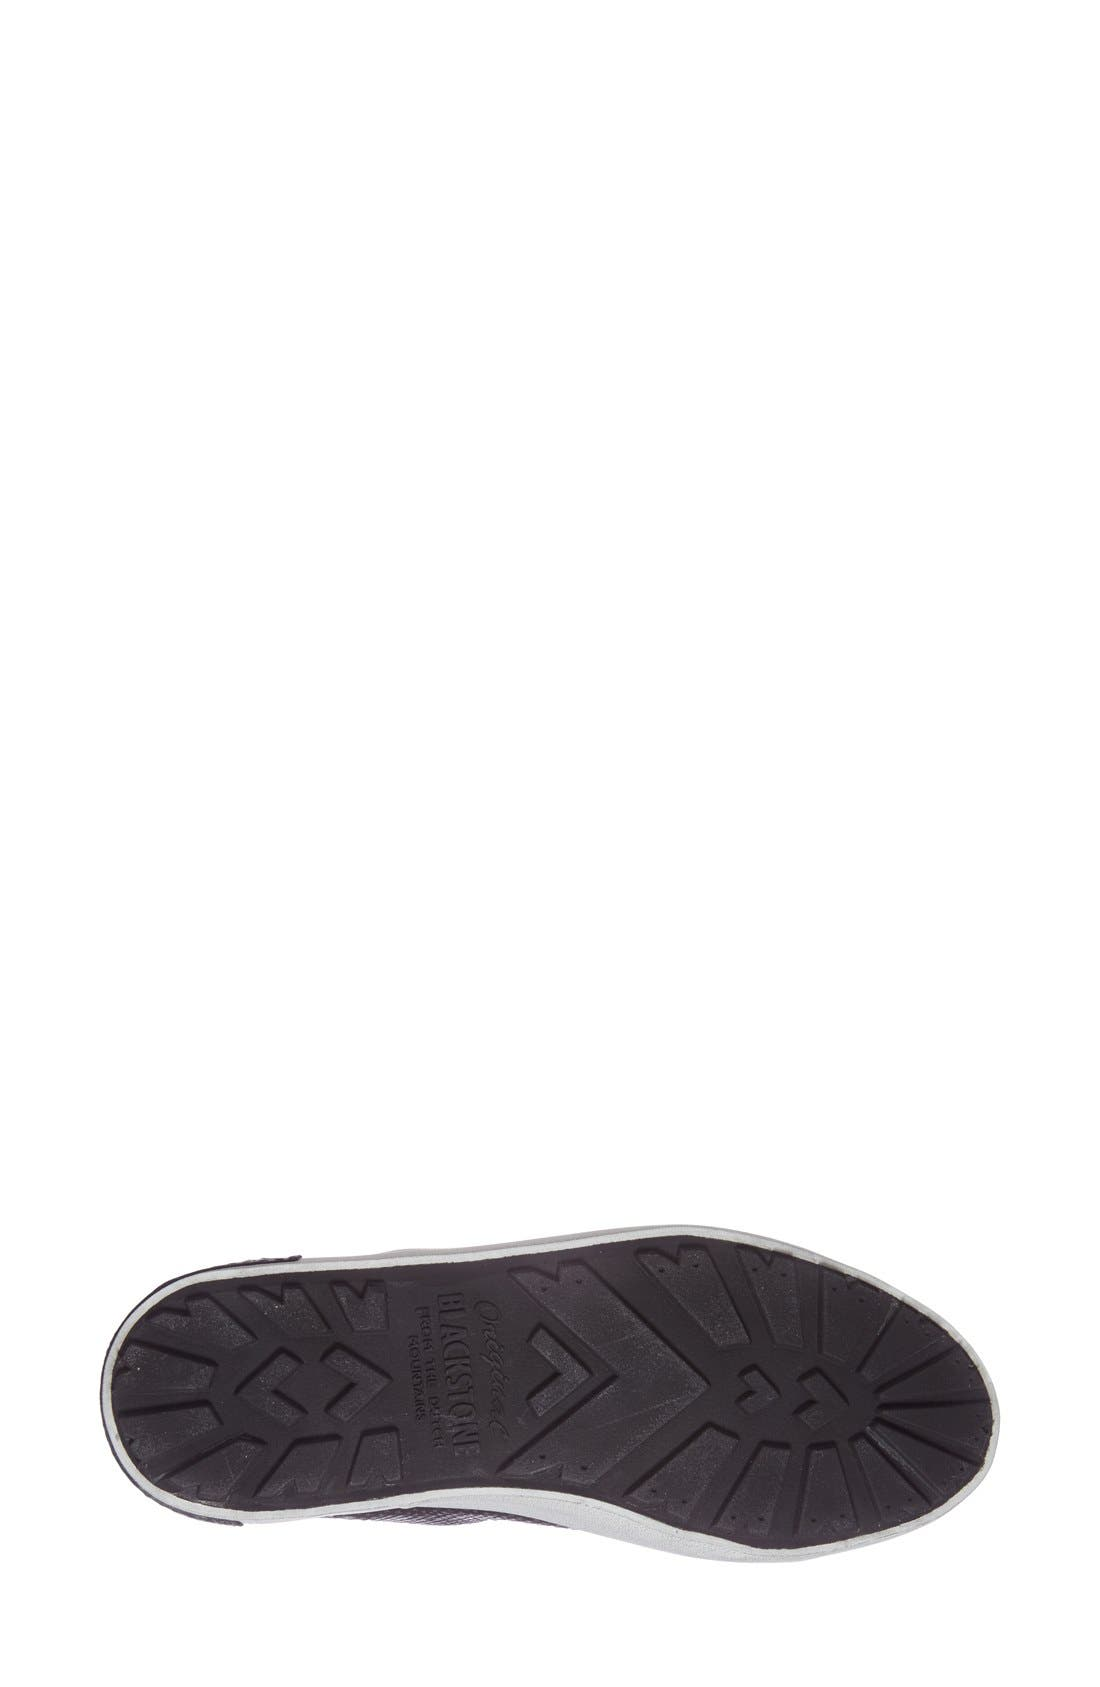 'KL57' High Top Sneaker,                             Alternate thumbnail 4, color,                             Black Metallic Leather